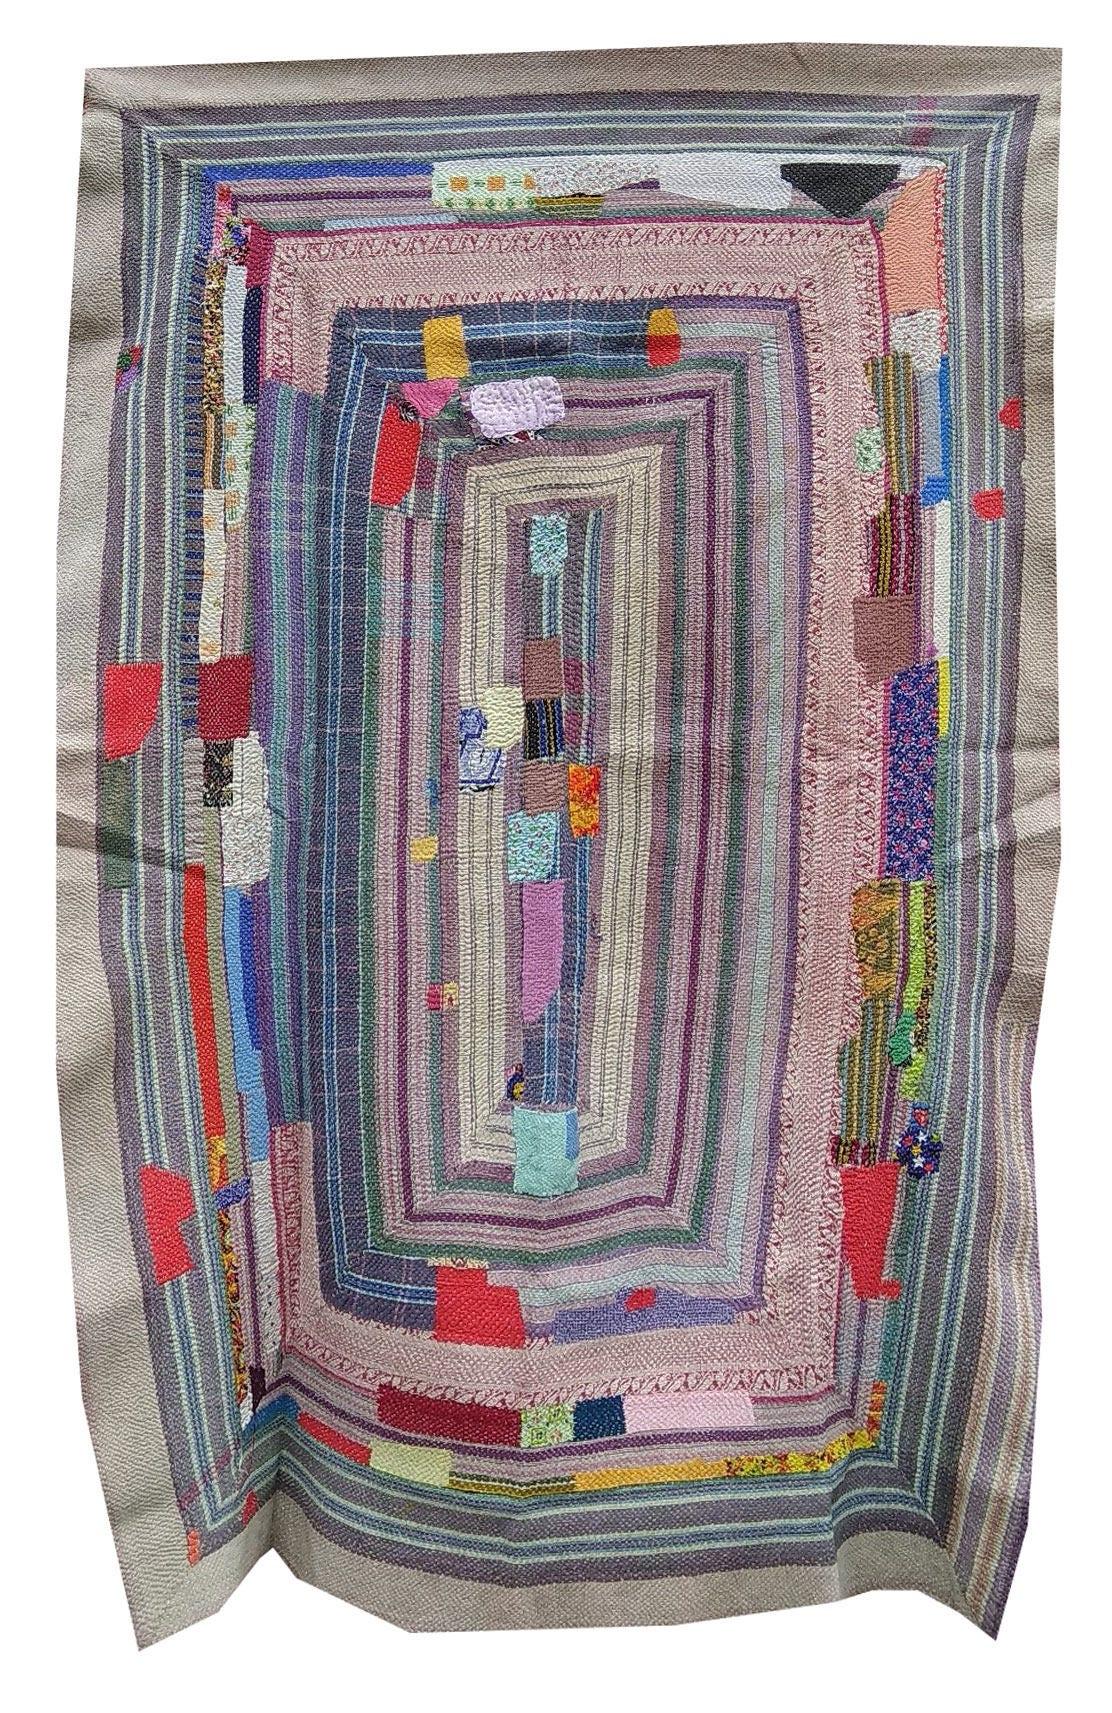 Vintage Kantha Embroidery GREY Reversible Quilt Kantha Bedspread Indian Blanket Kantha Throw Coverlet Decorative Throw